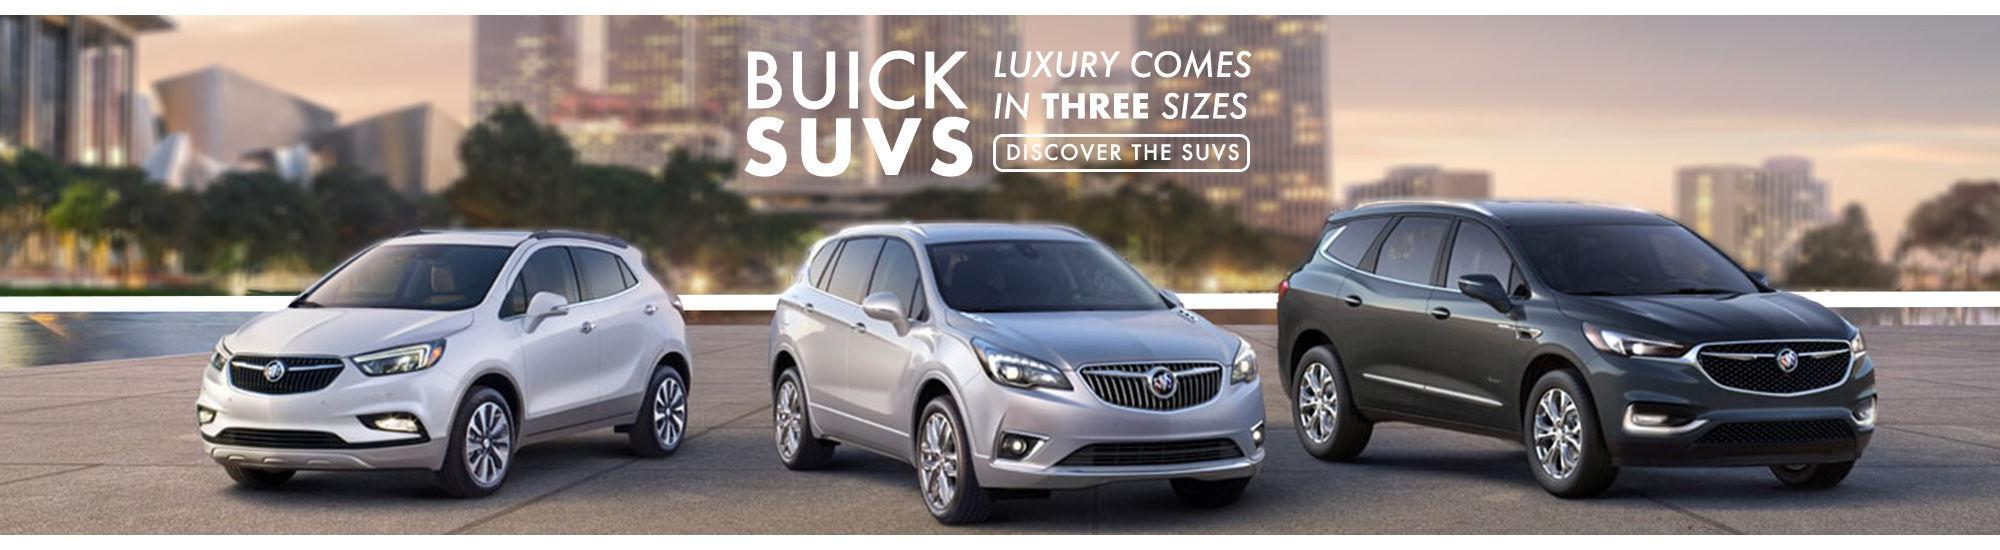 SUVS Buick 2019